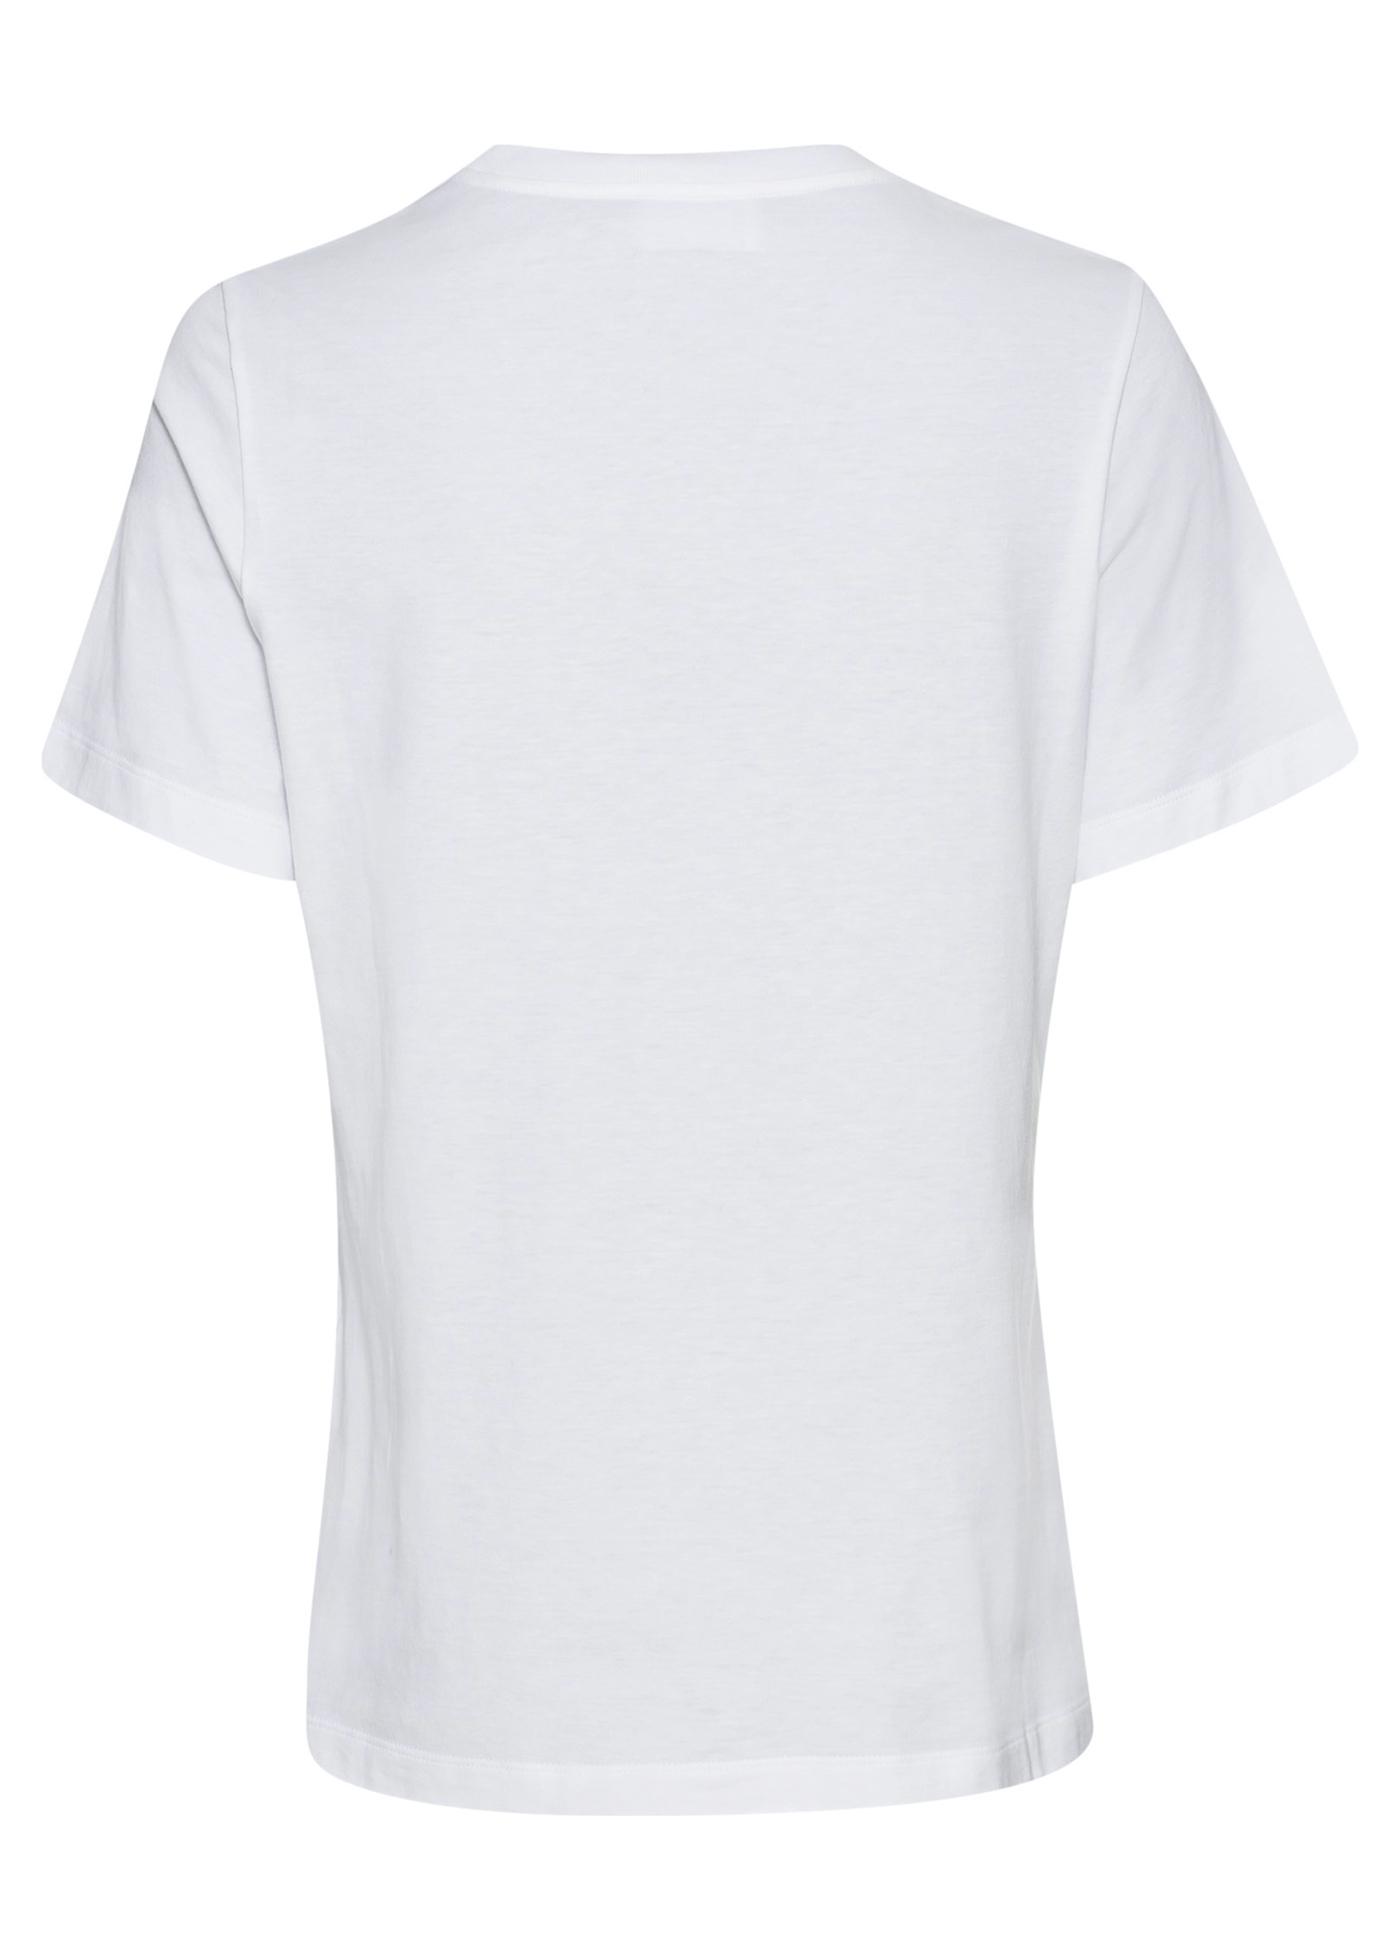 T-shirt manica corta image number 1